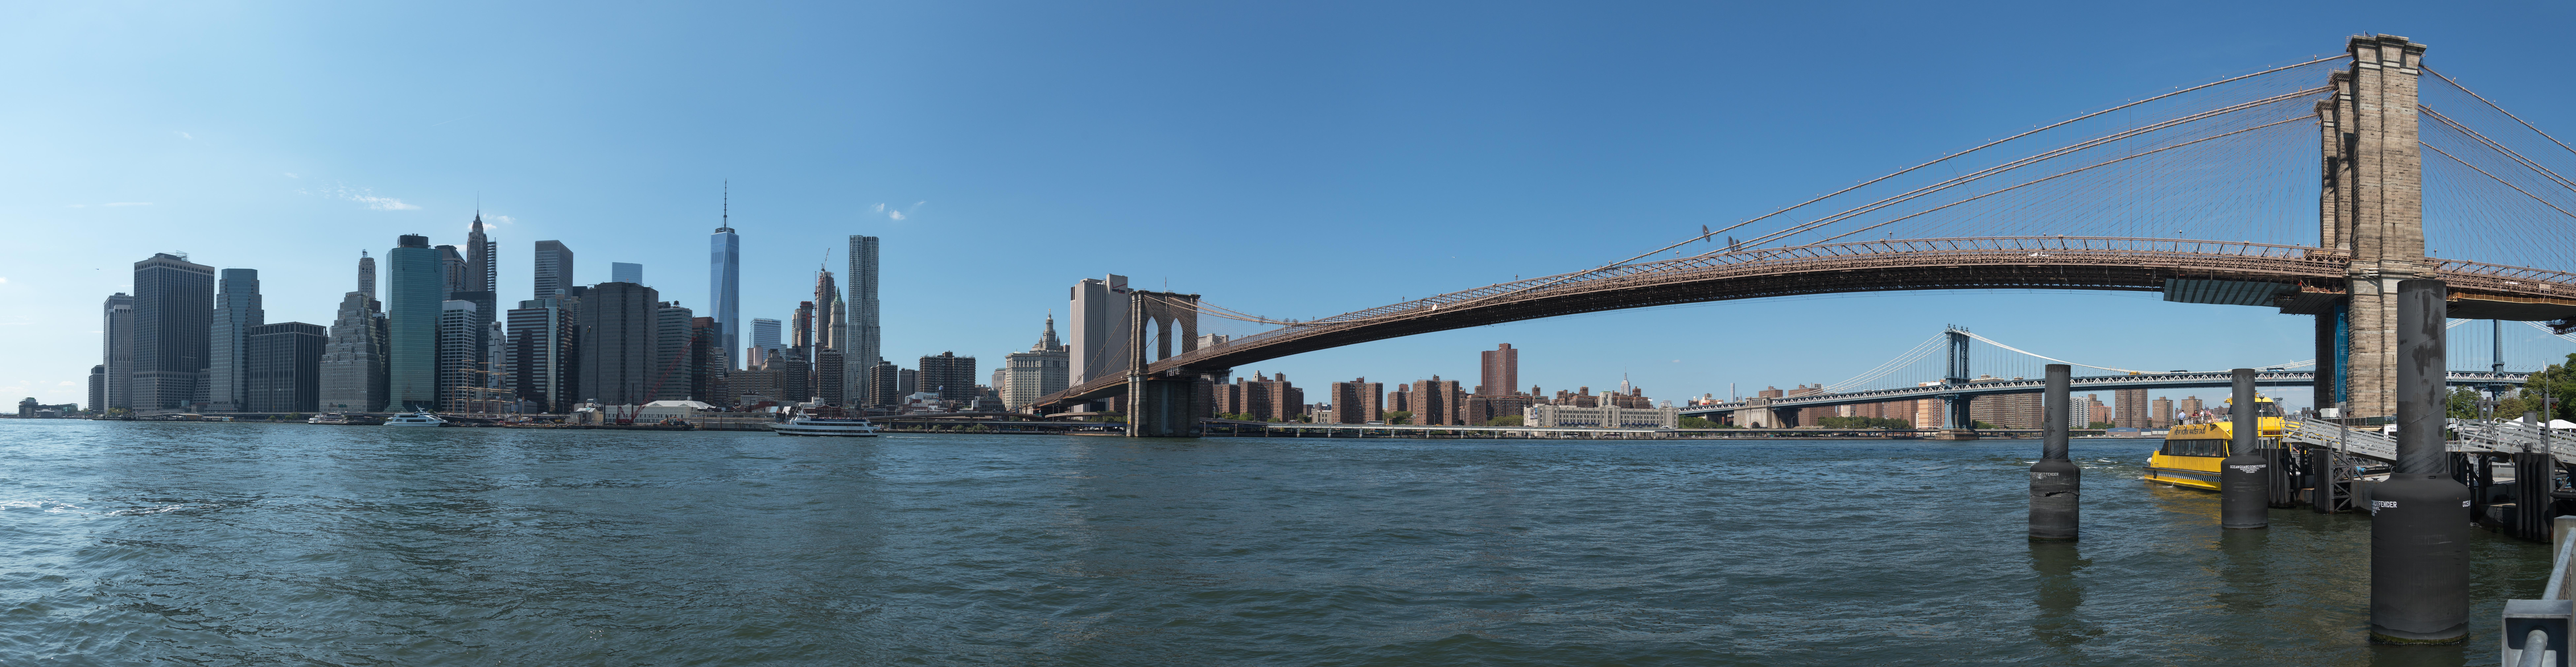 Lower Manhattan and Brooklyn Bridge Brooklyn Bridge